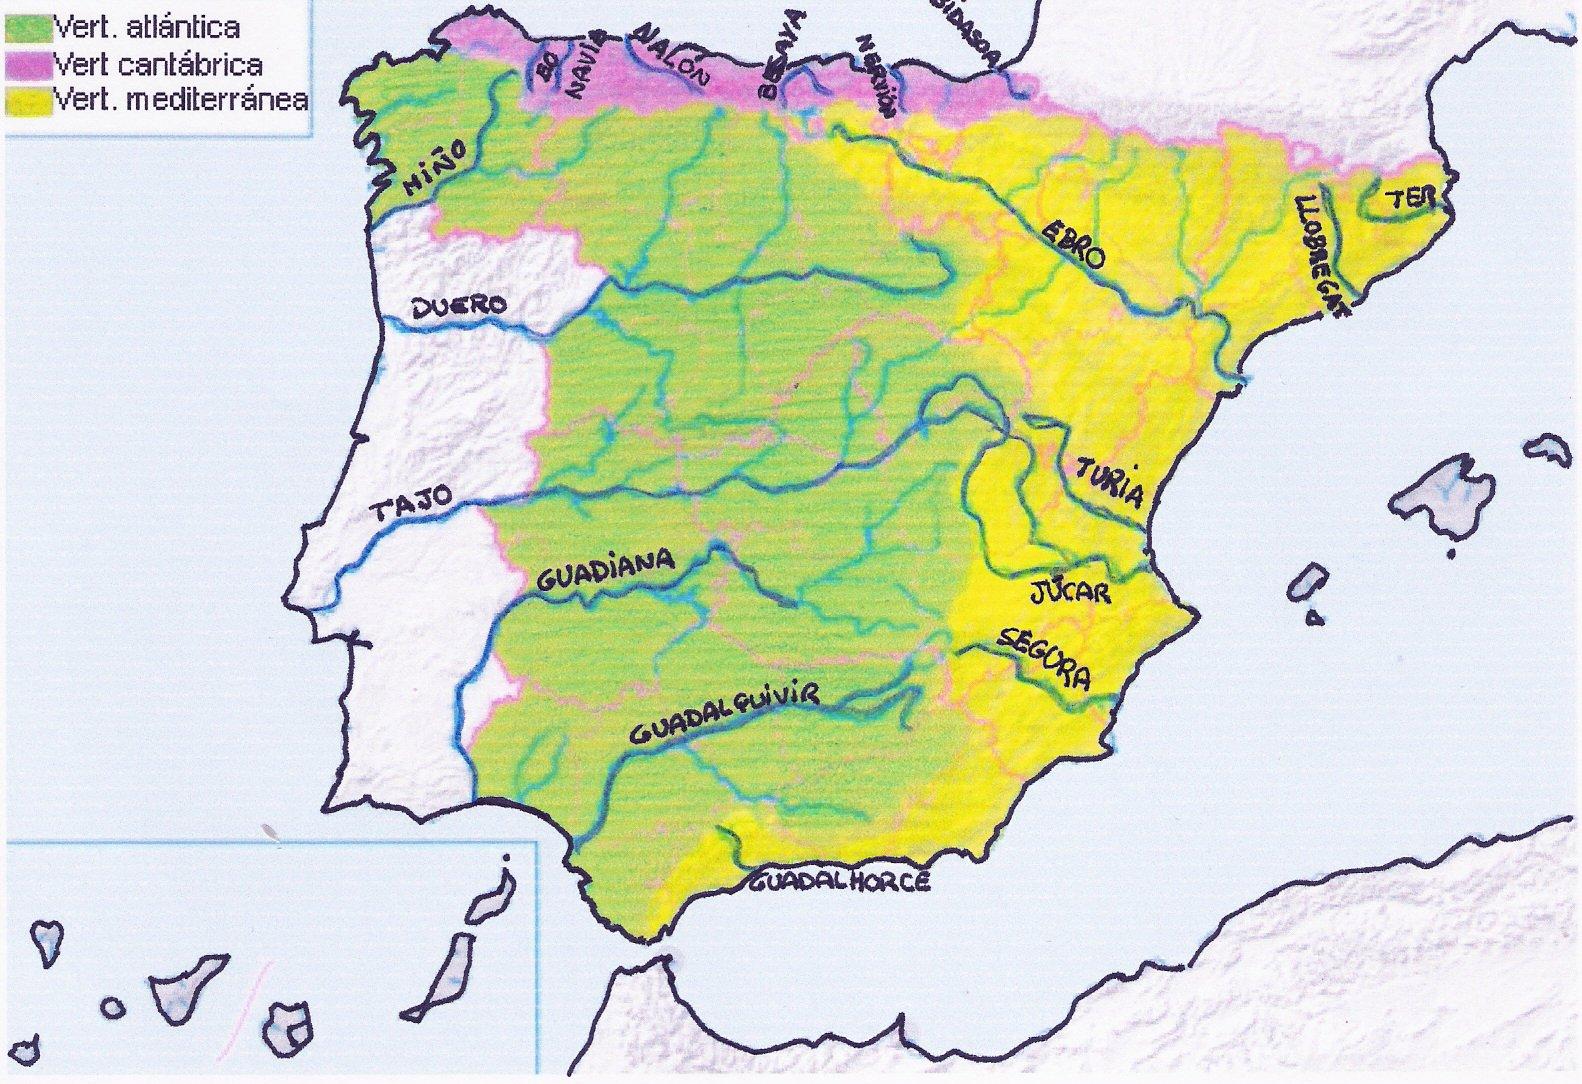 Vertientes Mapa Hidrografico De España.Tema 2 La Hidrografia De Espana Pagina Web De